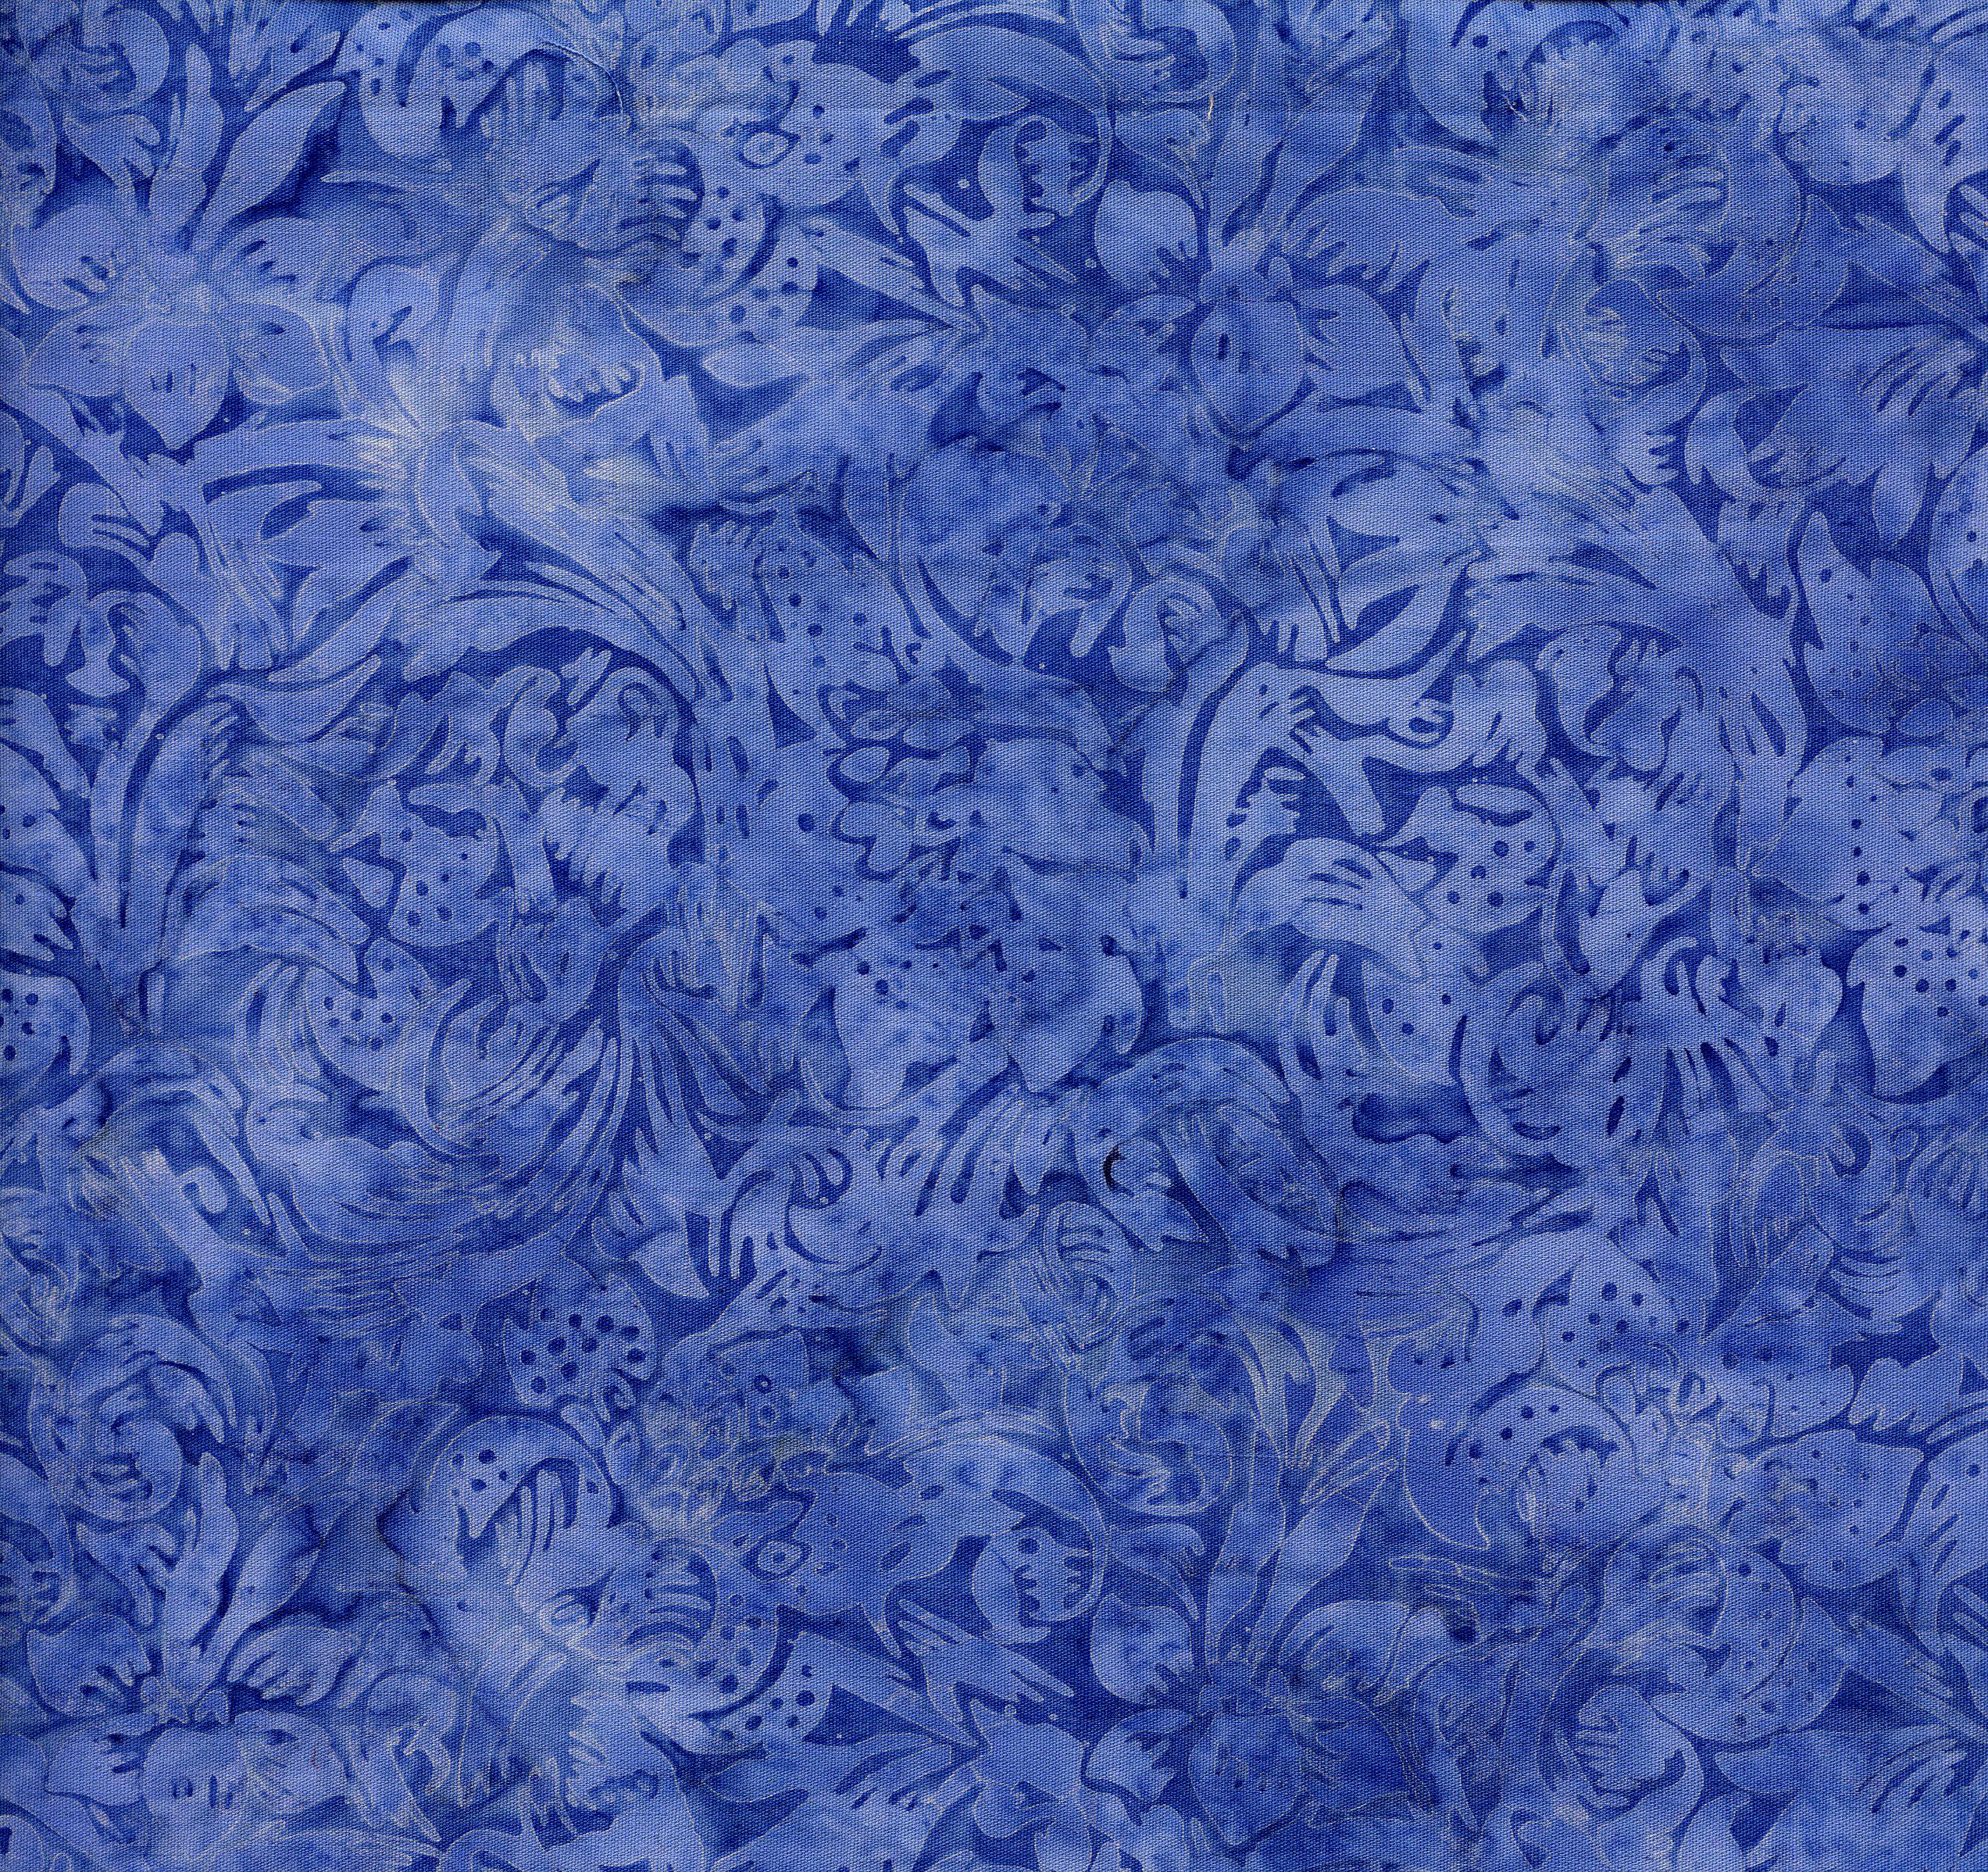 111822560 / LG Floral Vine-Dark Lagoon